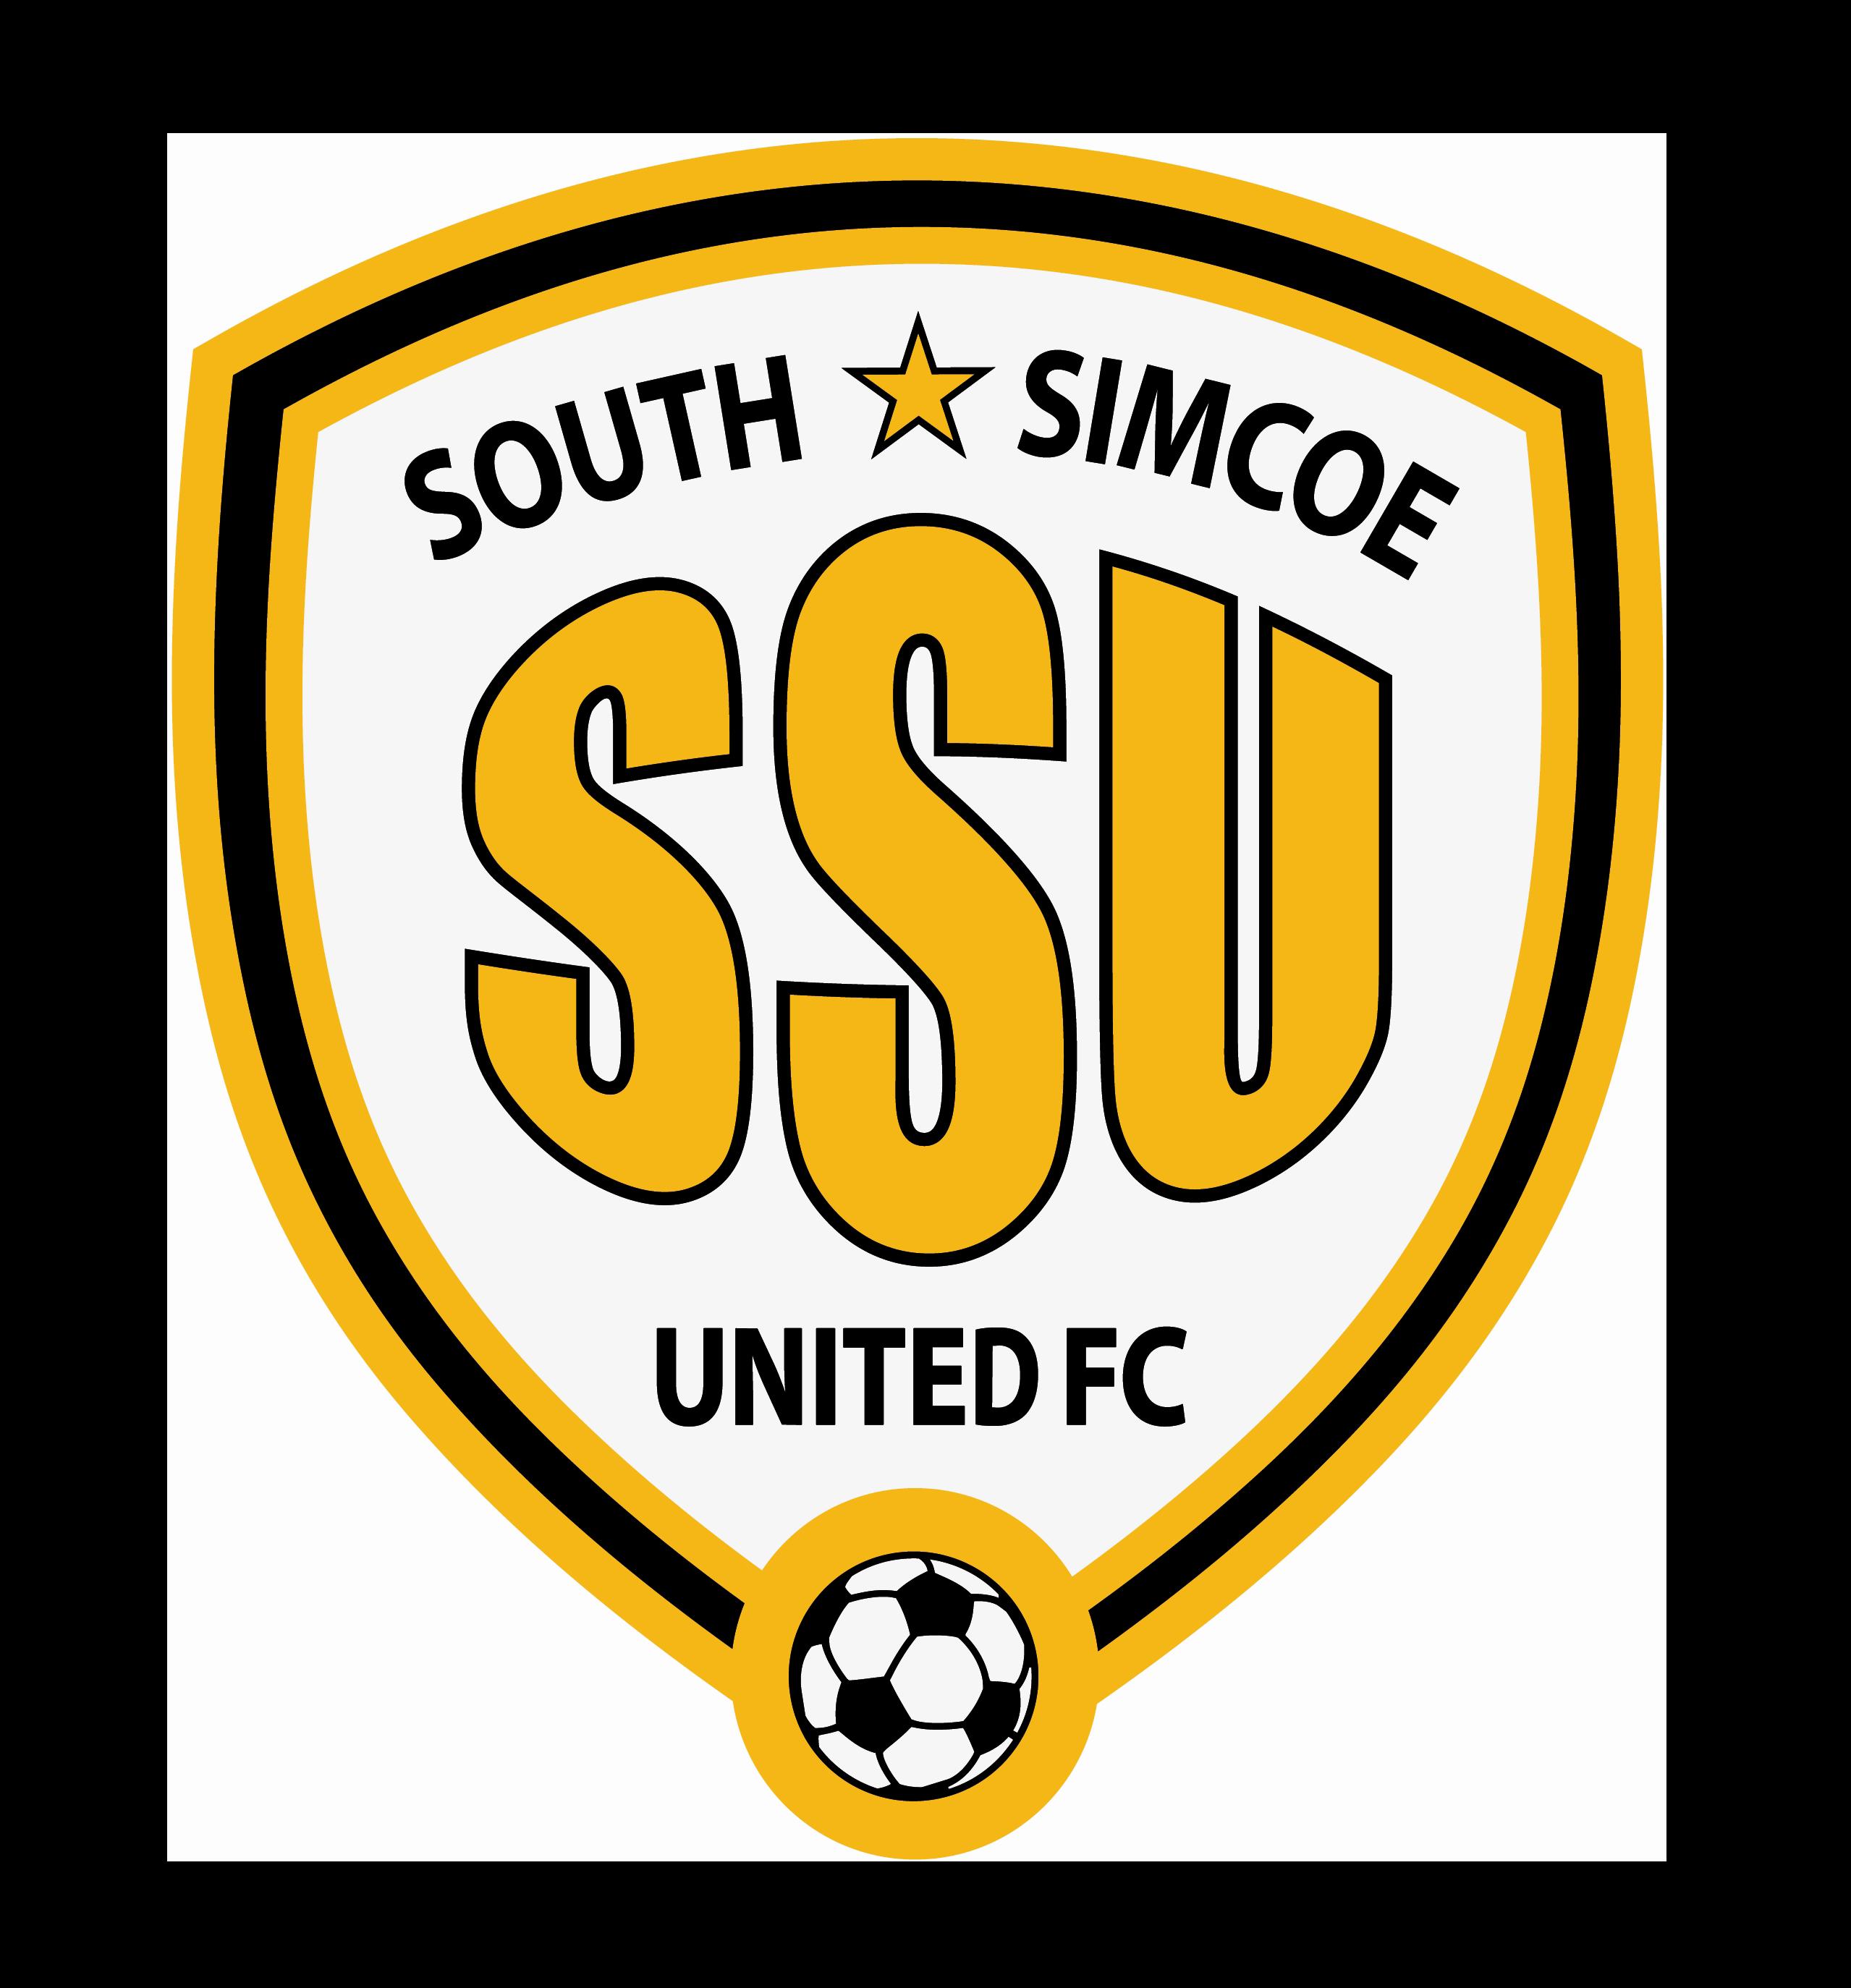 South Simcoe United FC